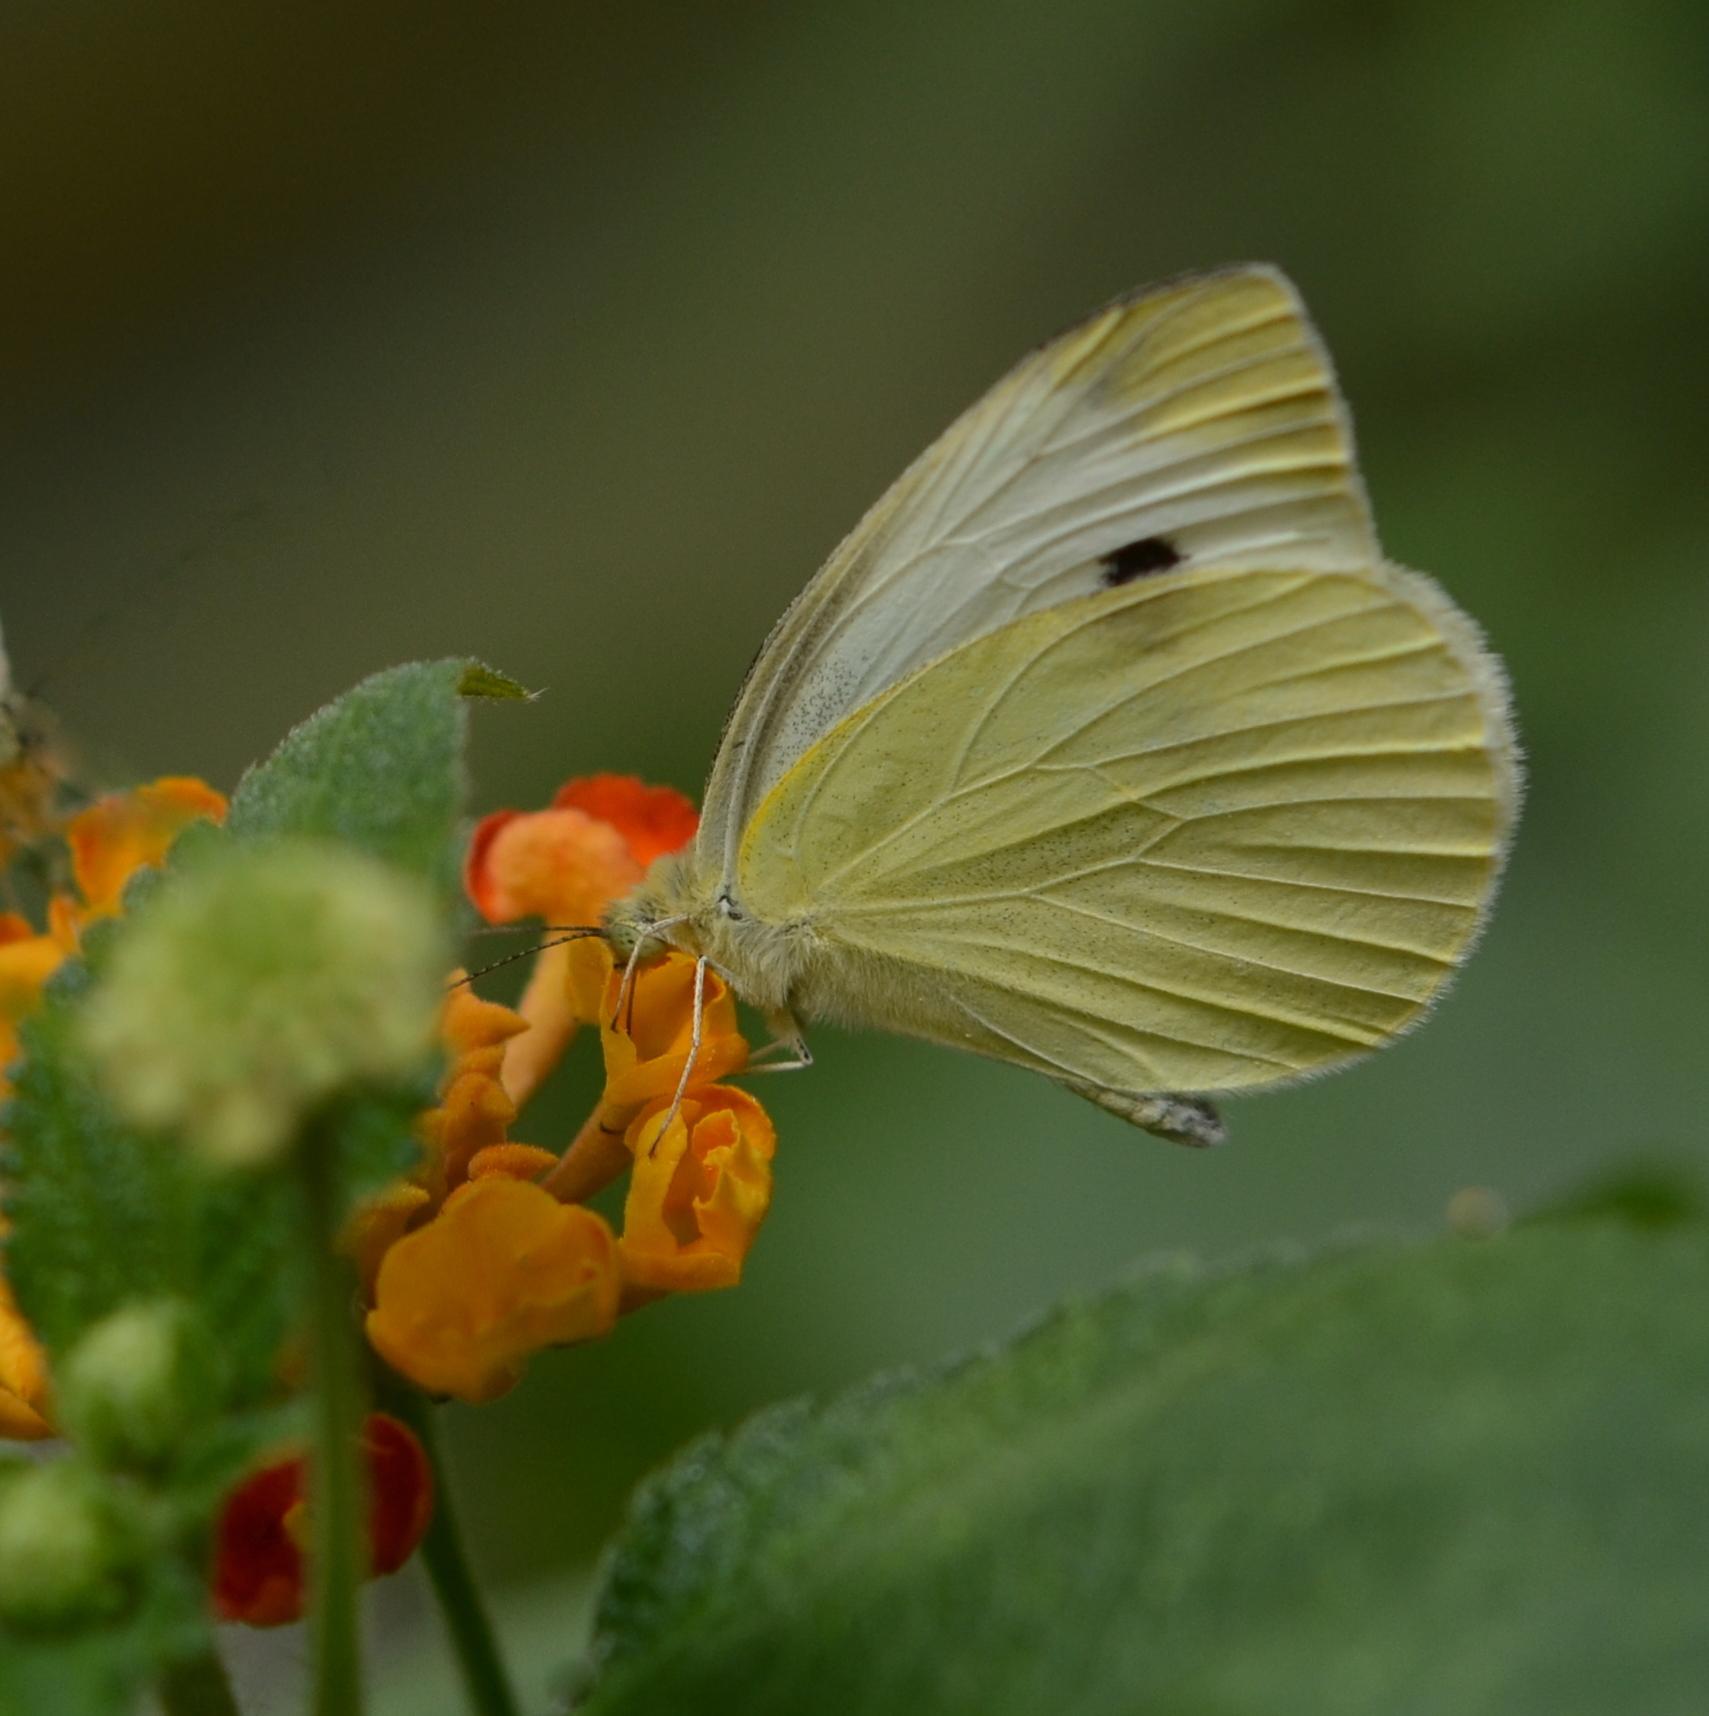 Délicieux ce nectar !